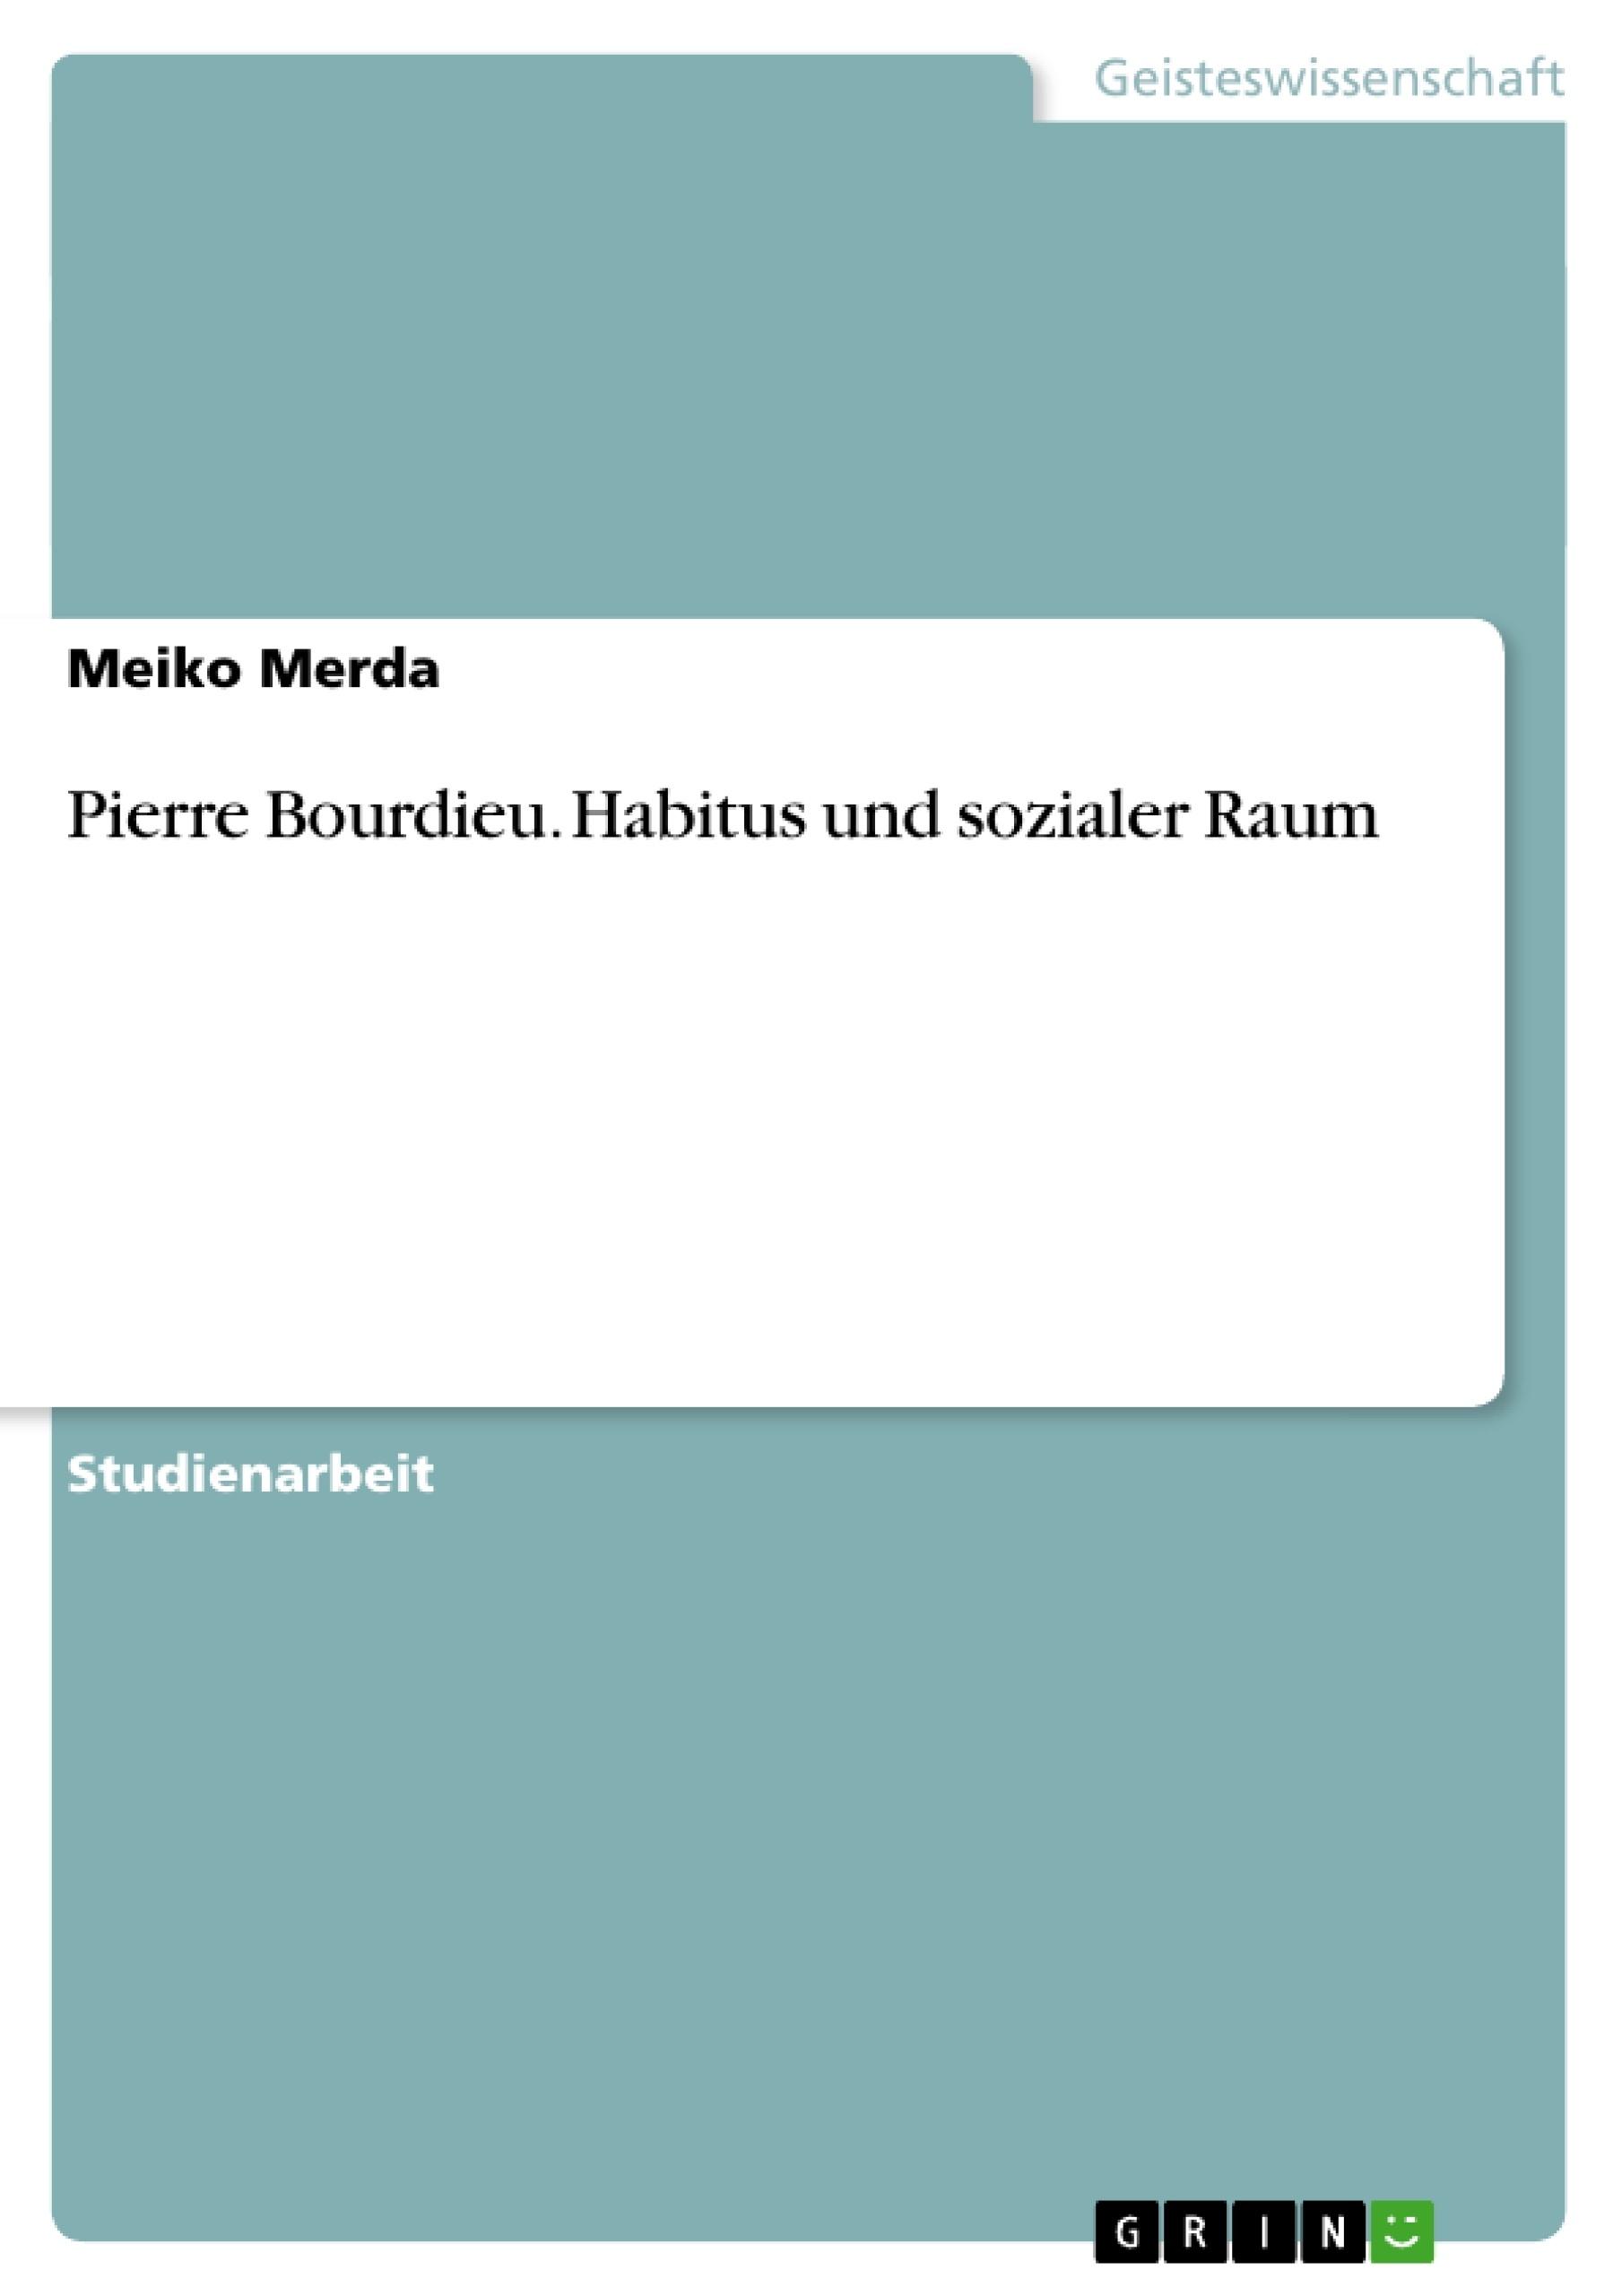 Titel: Pierre Bourdieu. Habitus und sozialer Raum